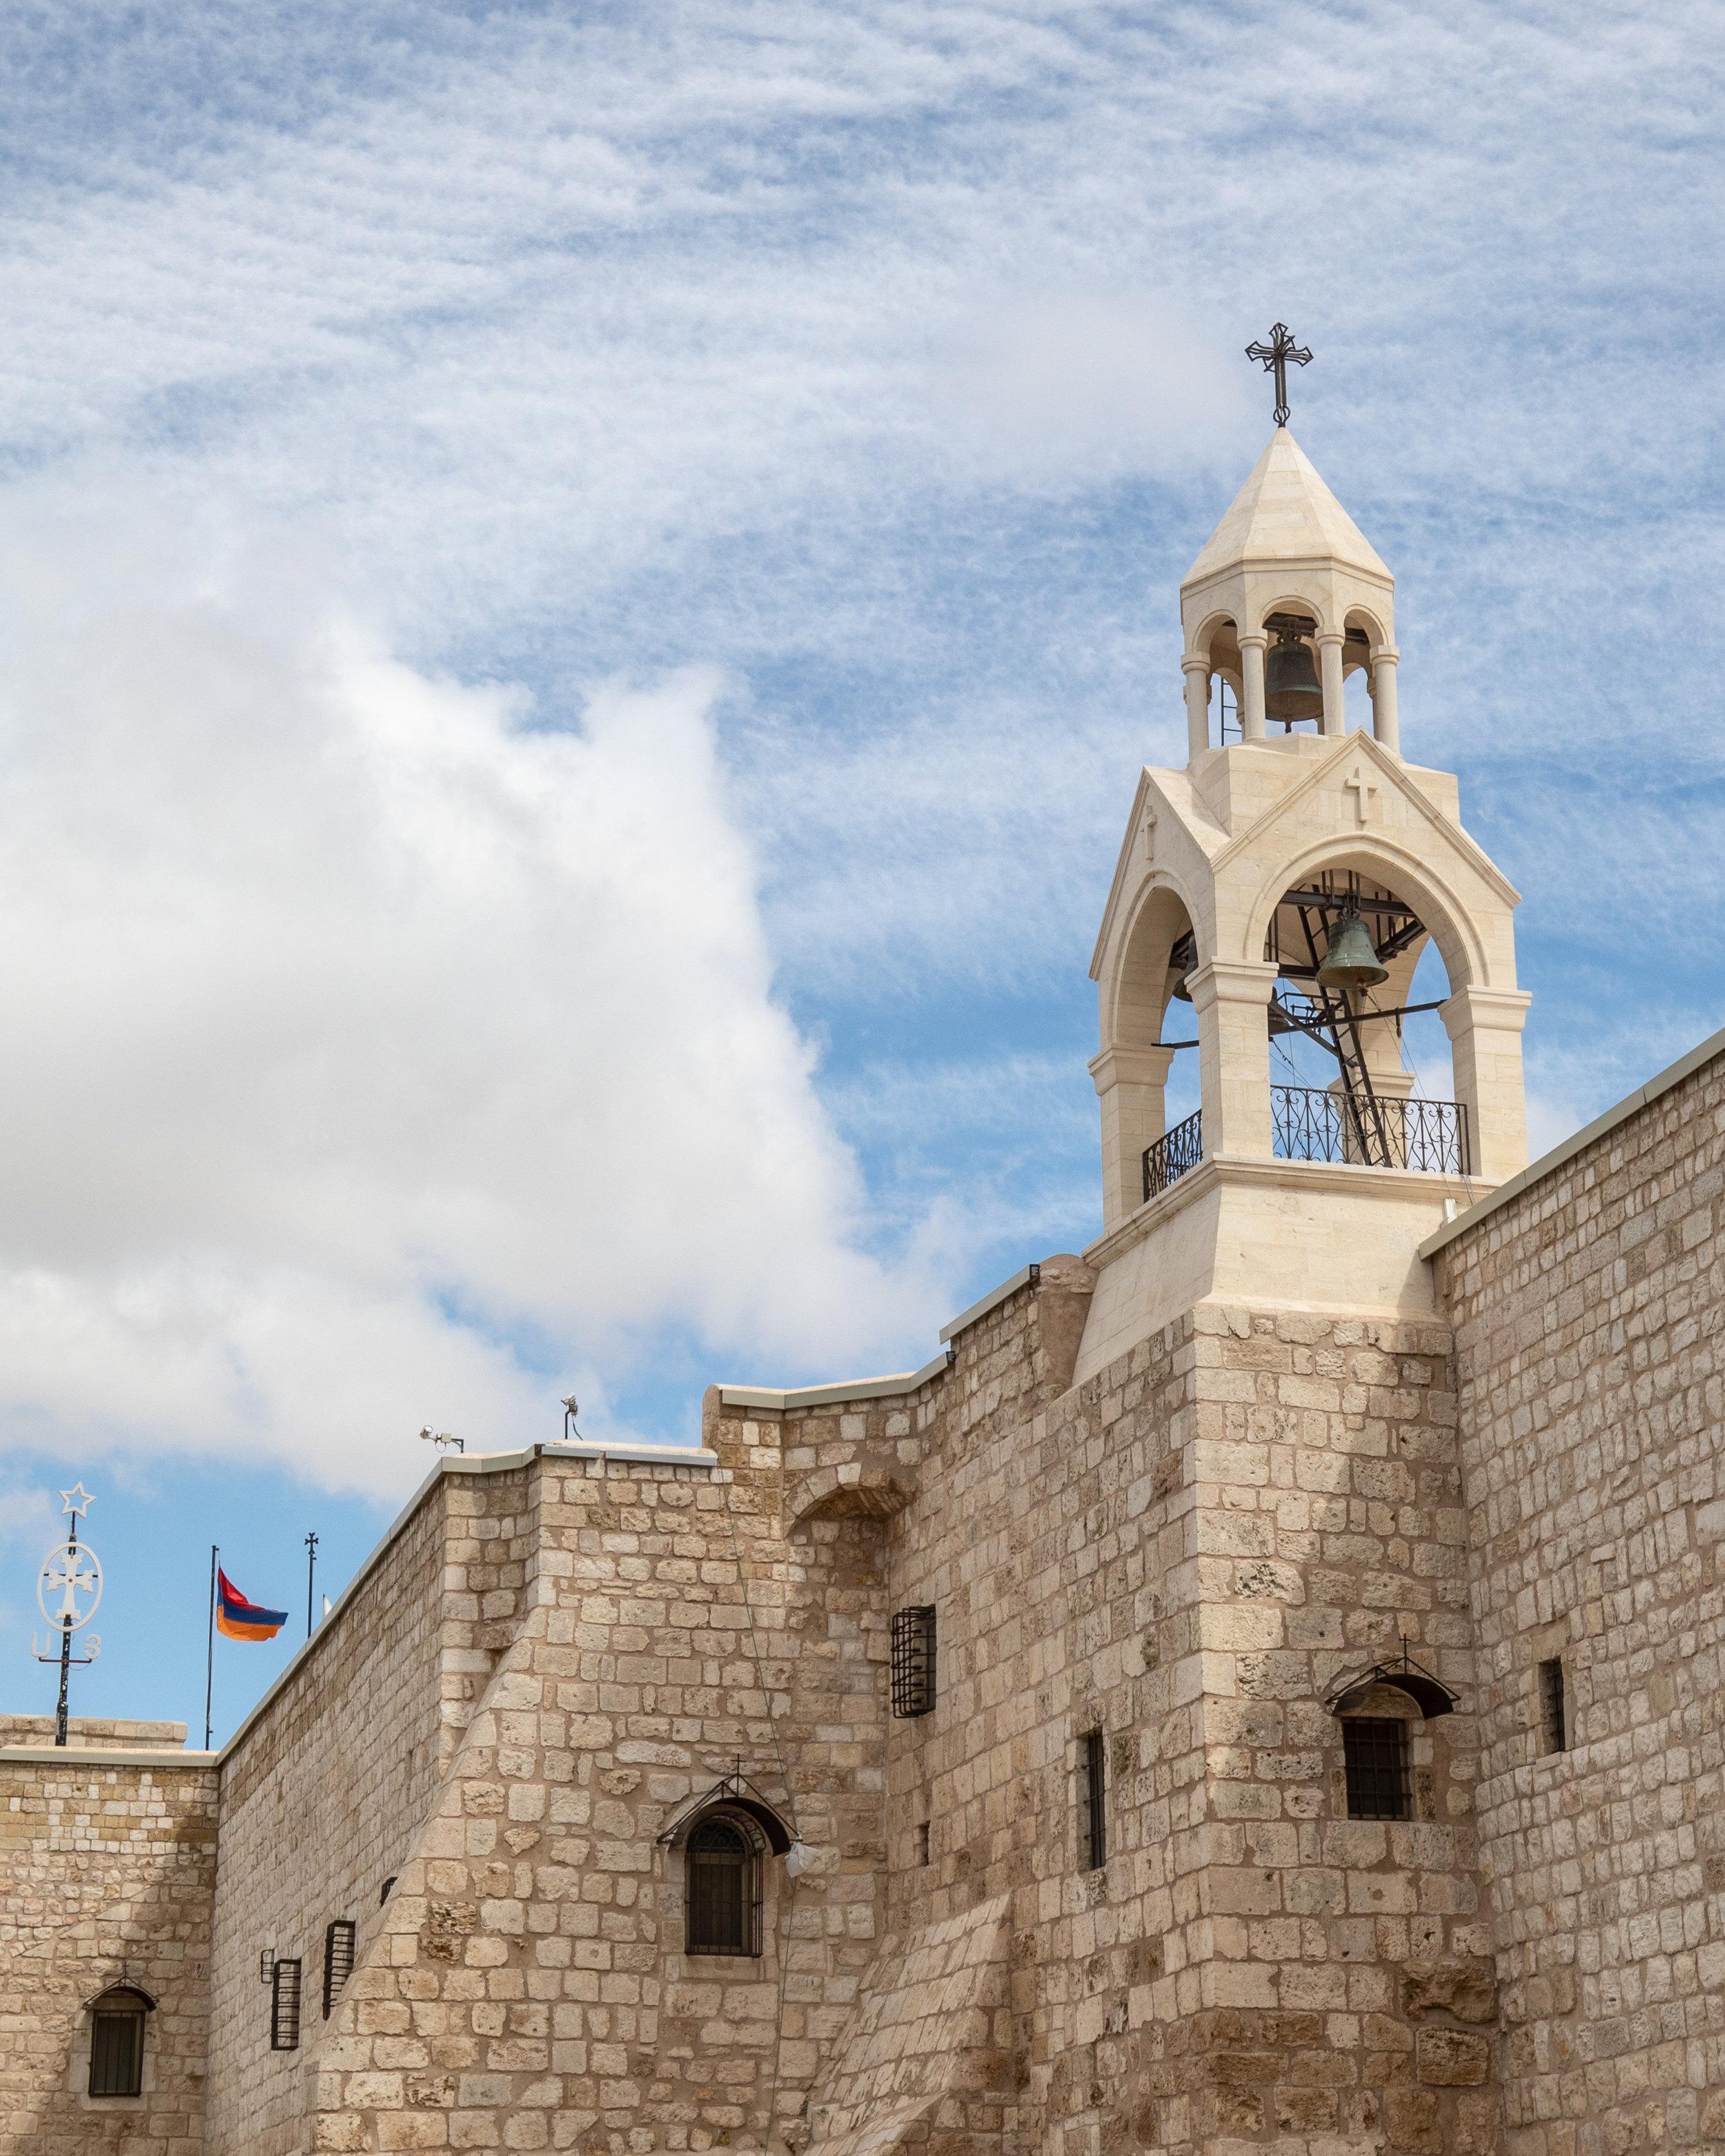 Church of the Nativity - Bethlehem trip from Jerusalem